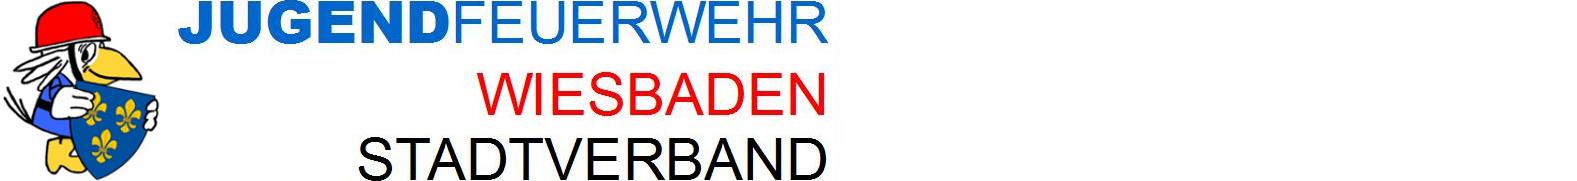 Jugendfeuerwehr Wiesbaden